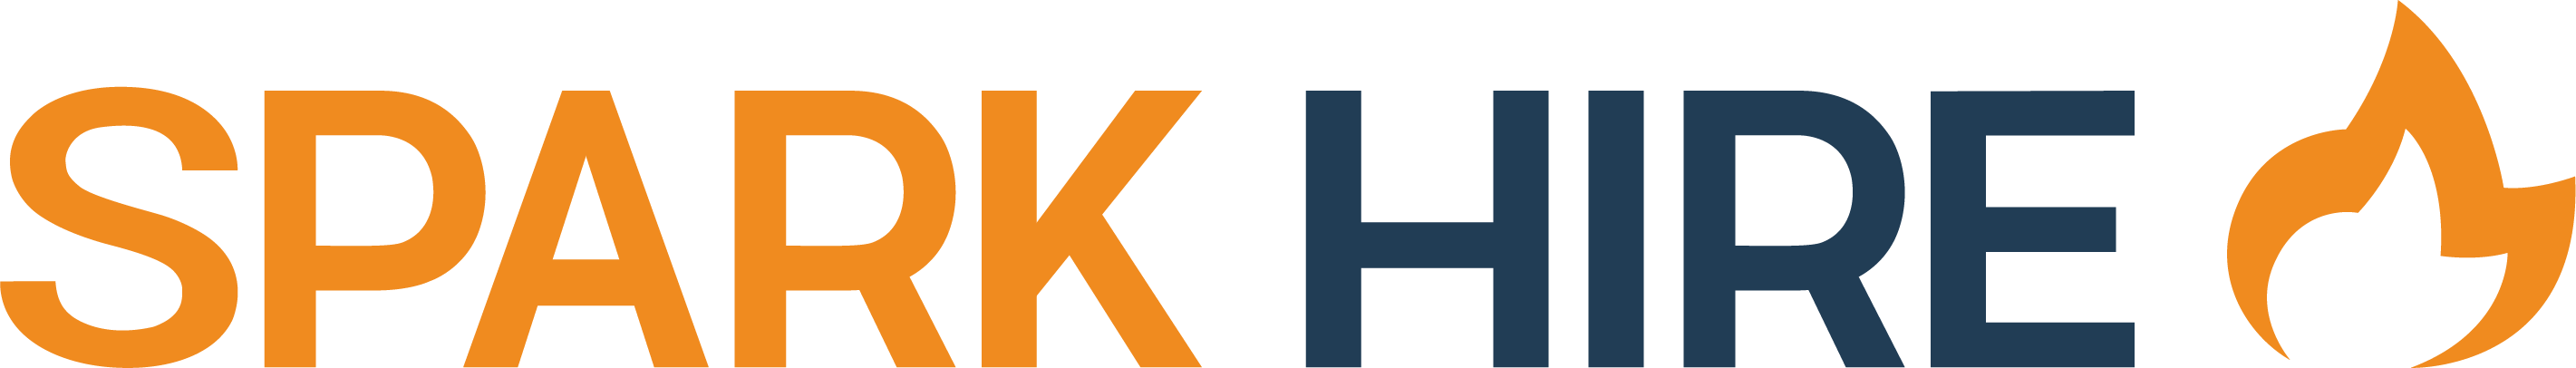 Spark Hire Logo - Orange and Blue